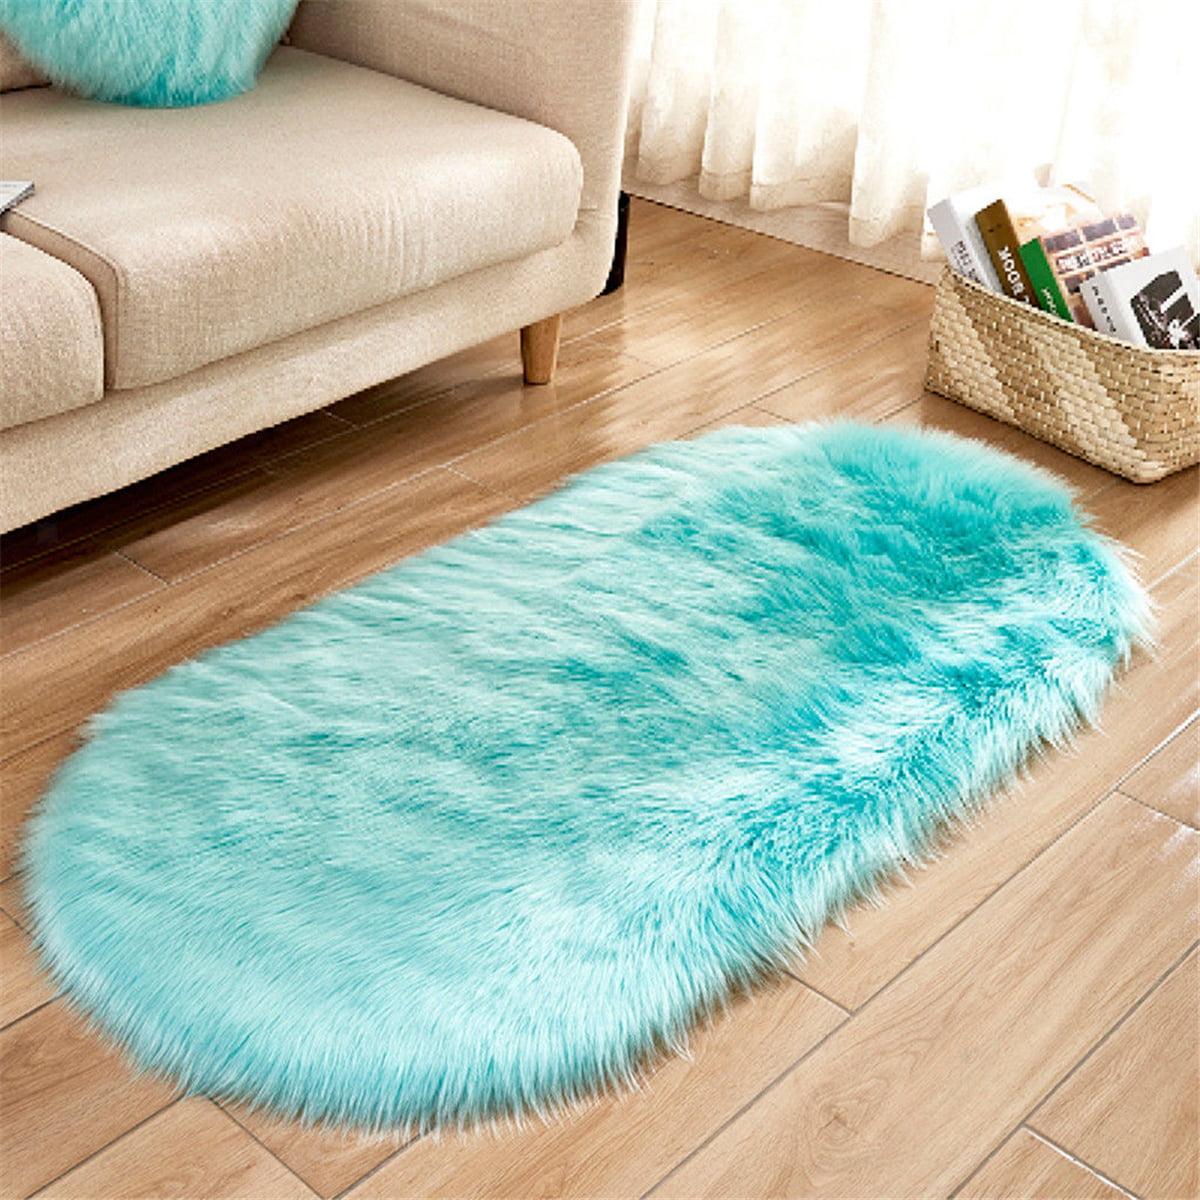 47''x20'' non skid oval plush area rug living room carpet